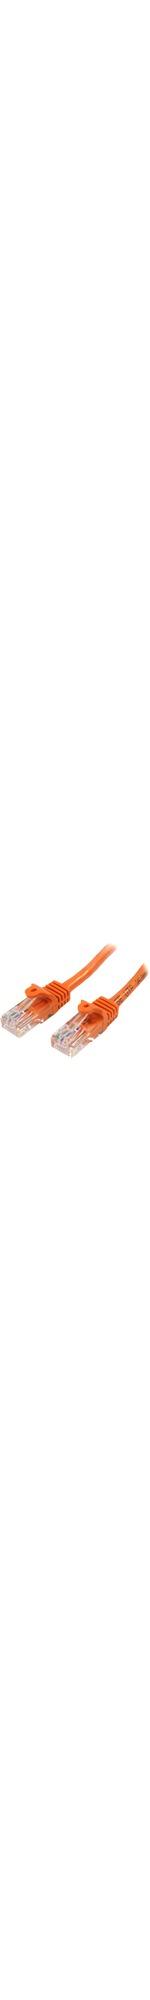 StarTech.com 1m Orange Cat5e Snagless RJ45 UTP Patch Cable - 1m Patch Cord - 1 x RJ-45 Male Network